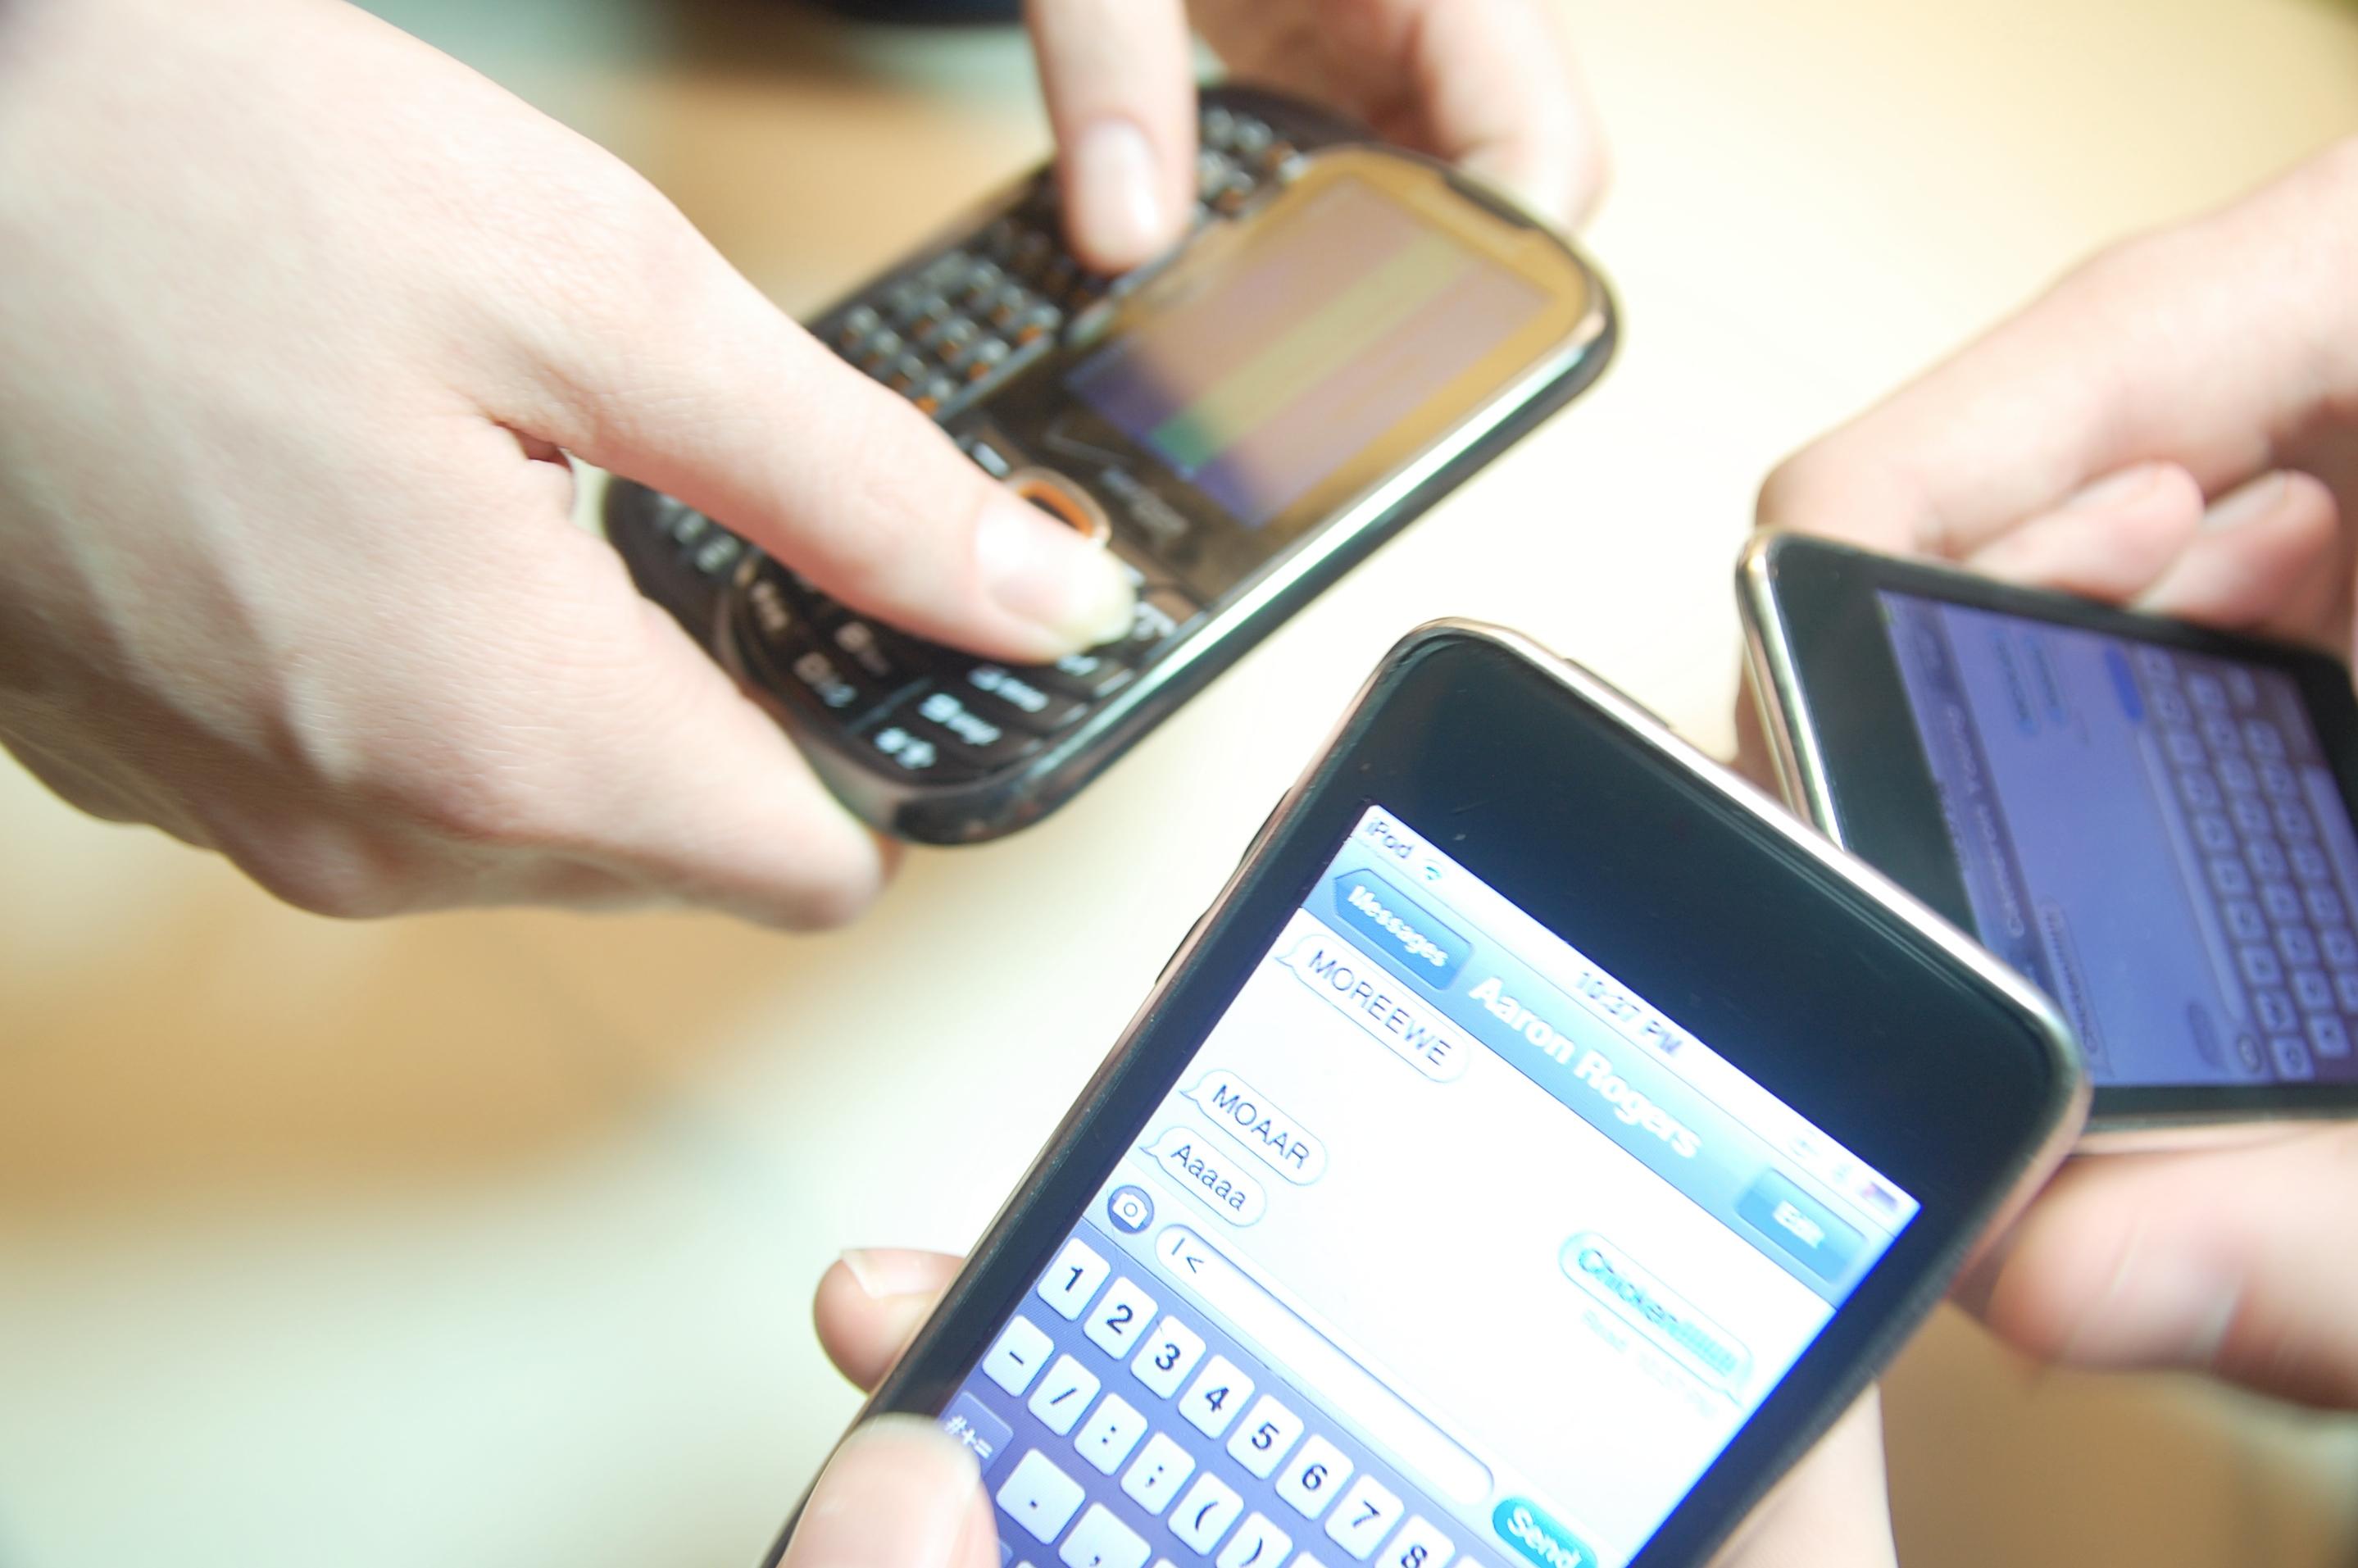 Three people texting using smartphones